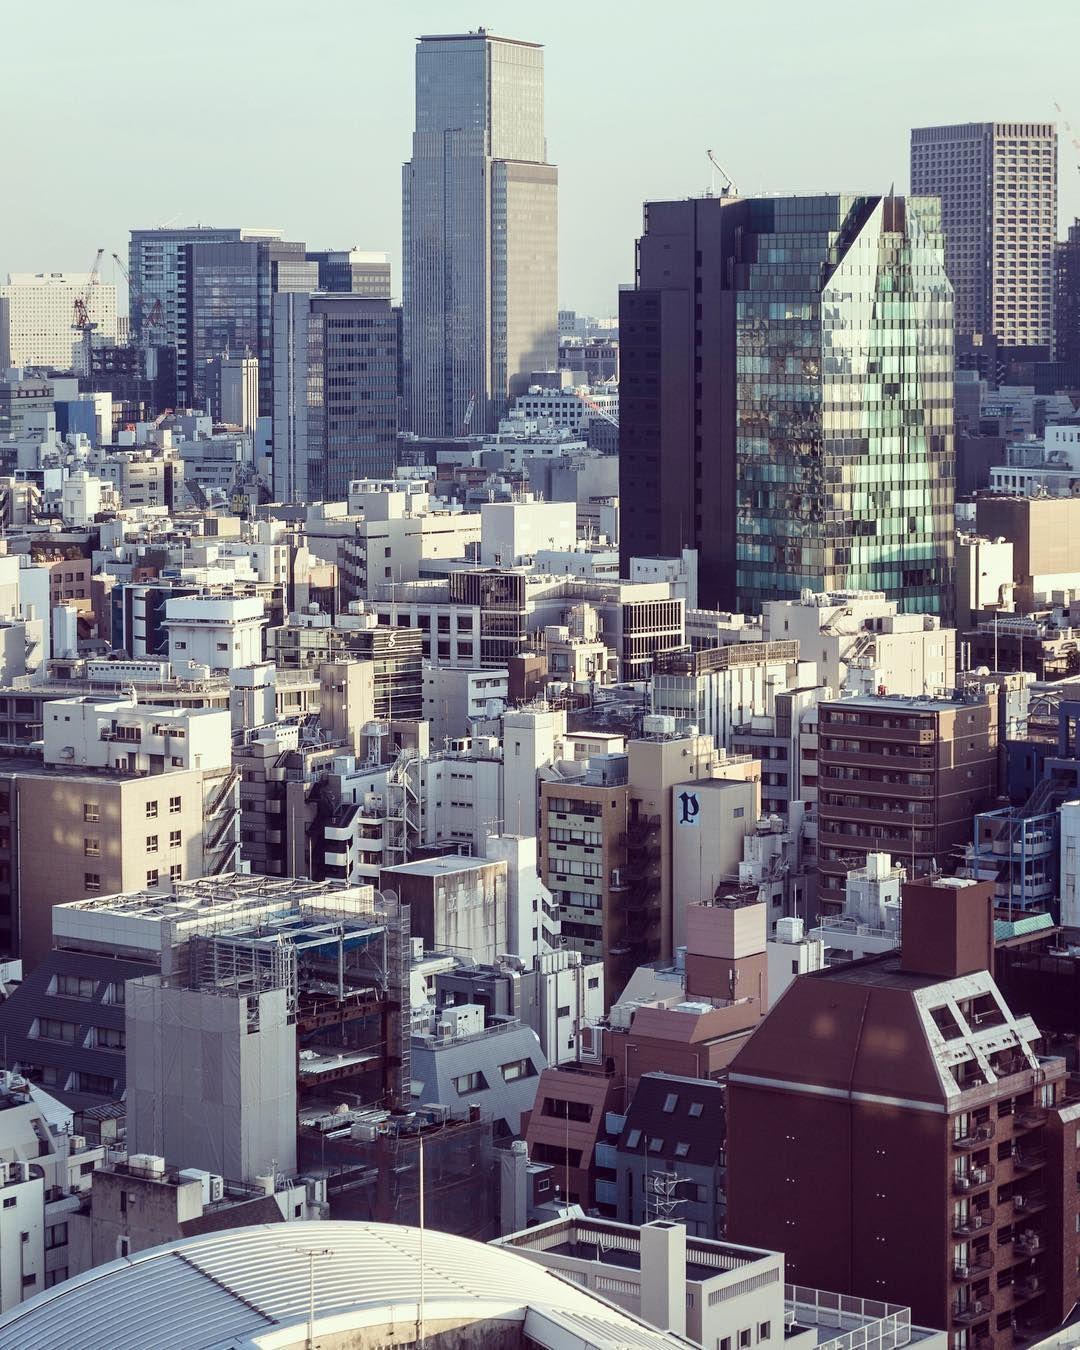 8919 Http Sandman Kk Tumblr Com Post 158928335076 Tokyo Japan Cityscape Urban Architecture Buildings Sky Crowded Skyscrapers Urbane 東京 風景 都市景観 都市計画